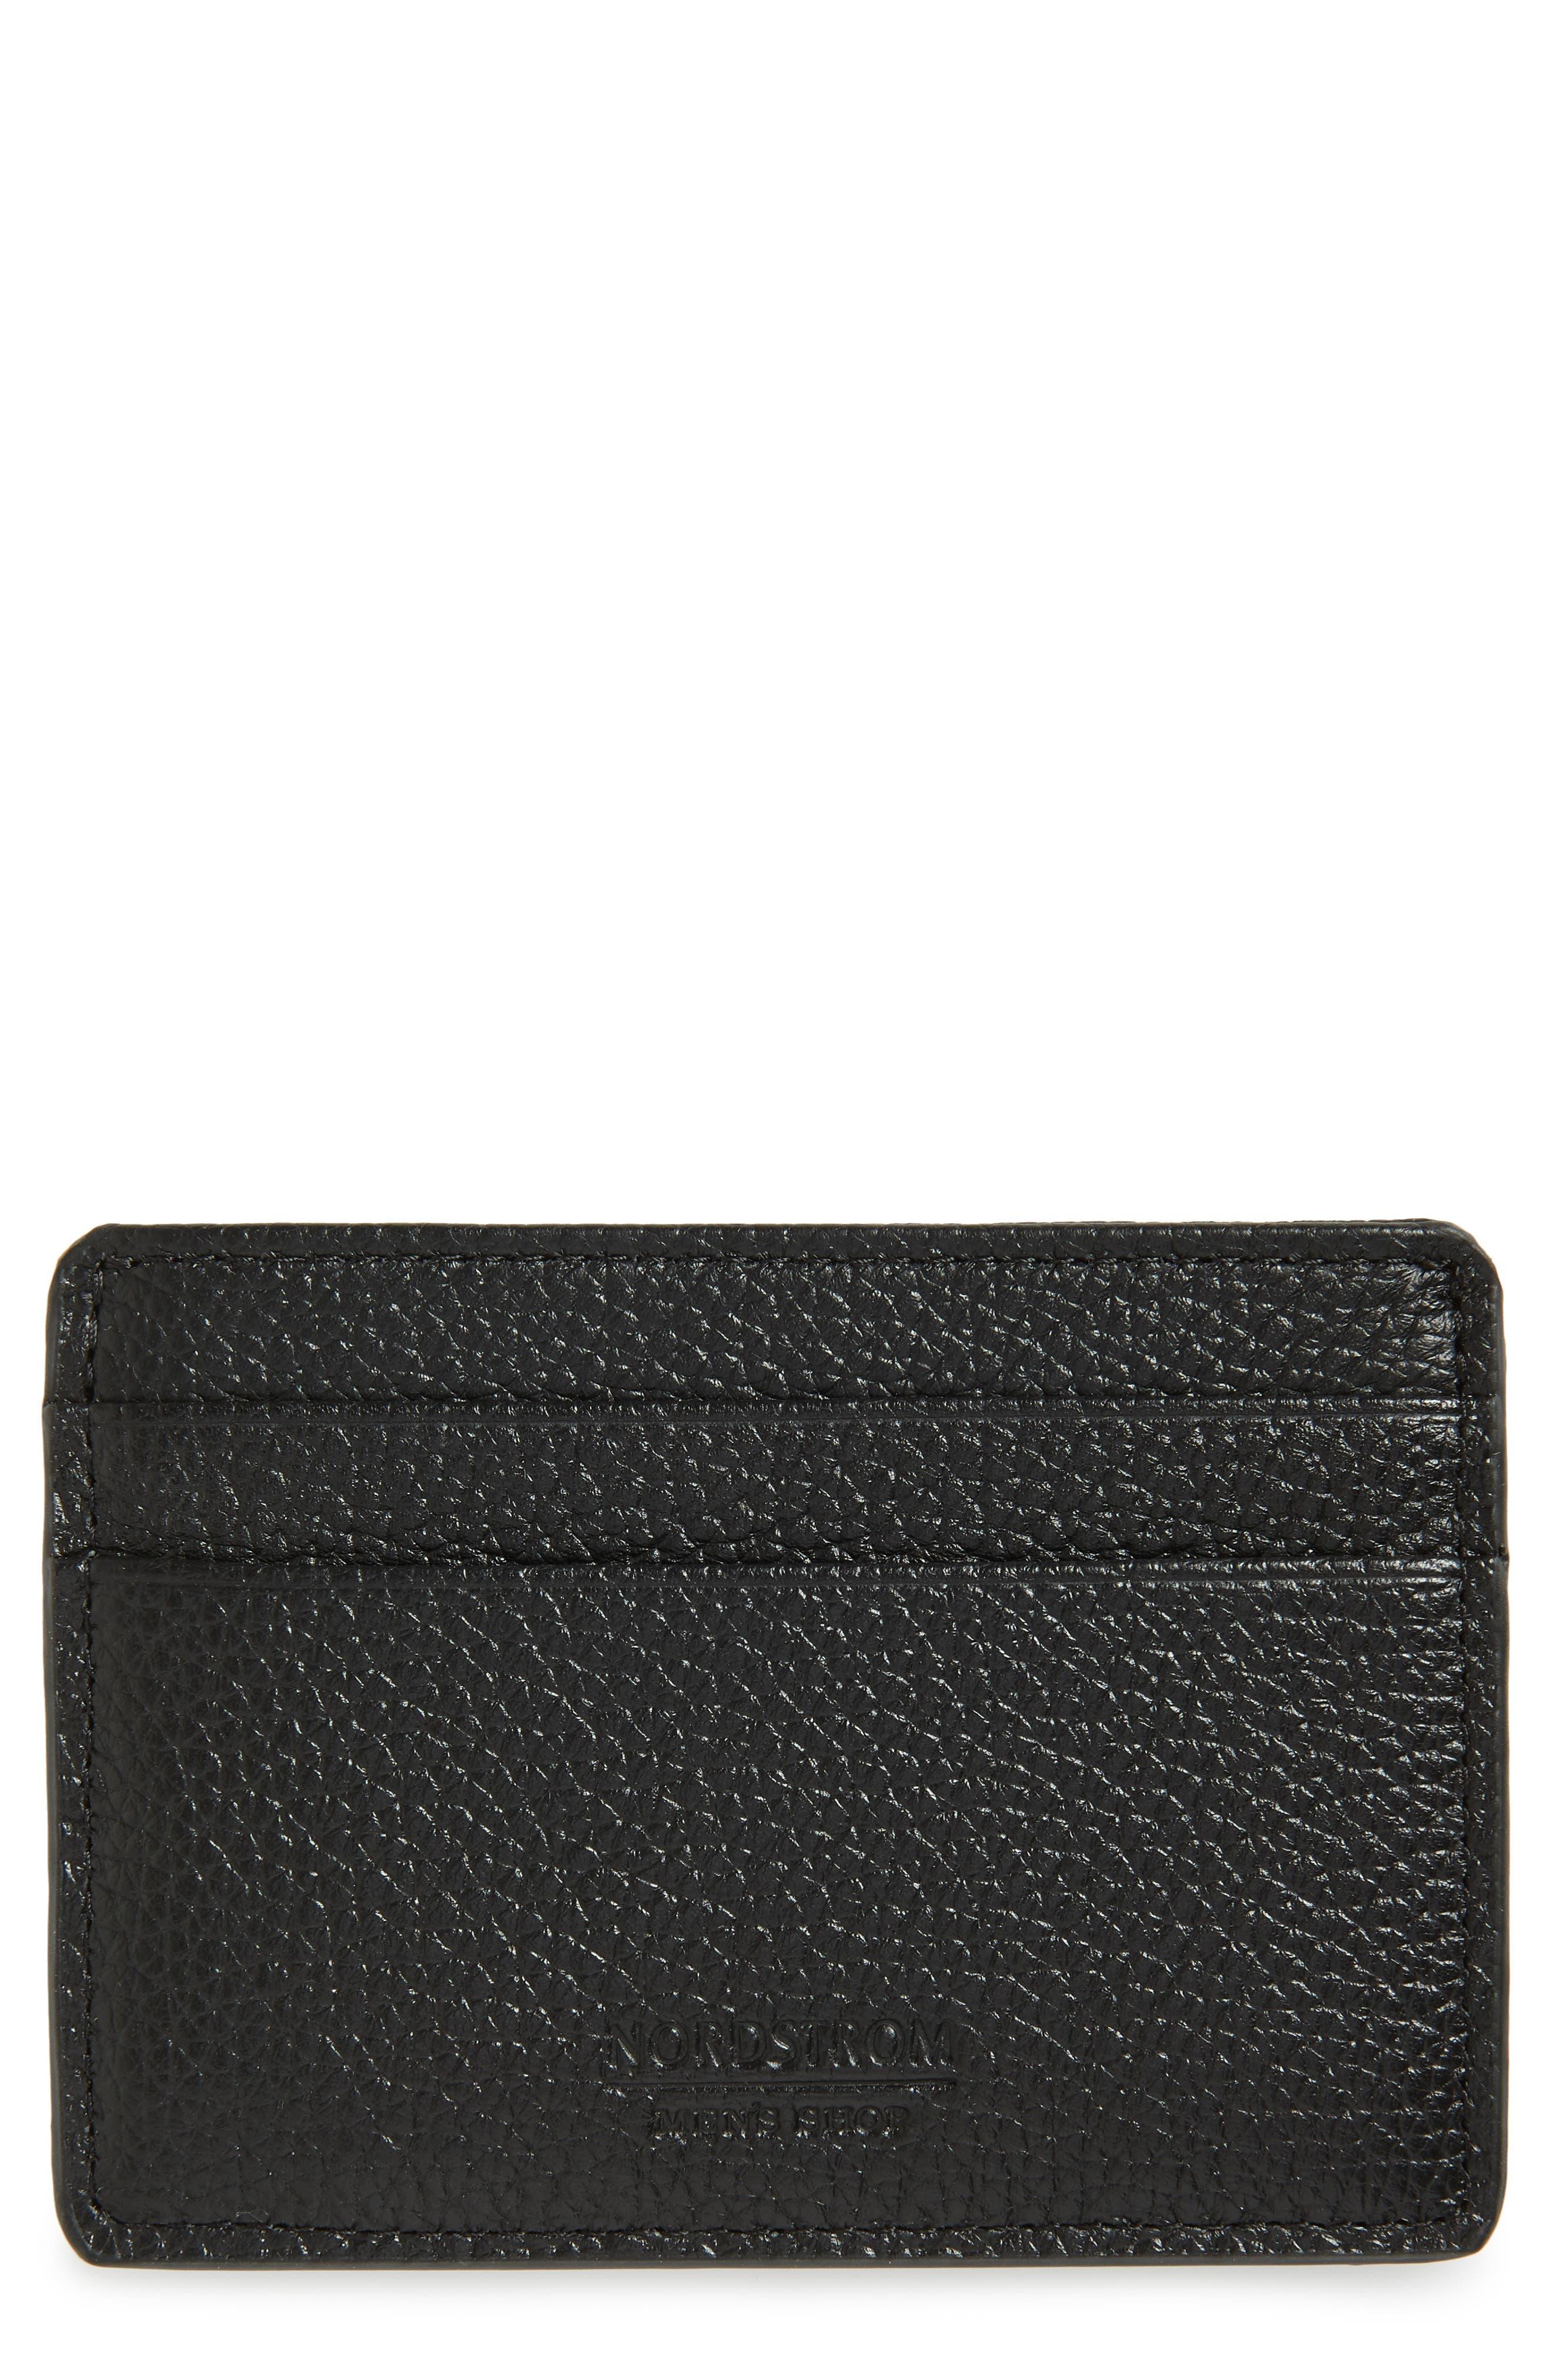 Midland RFID Leather Card Case,                         Main,                         color, BLACK